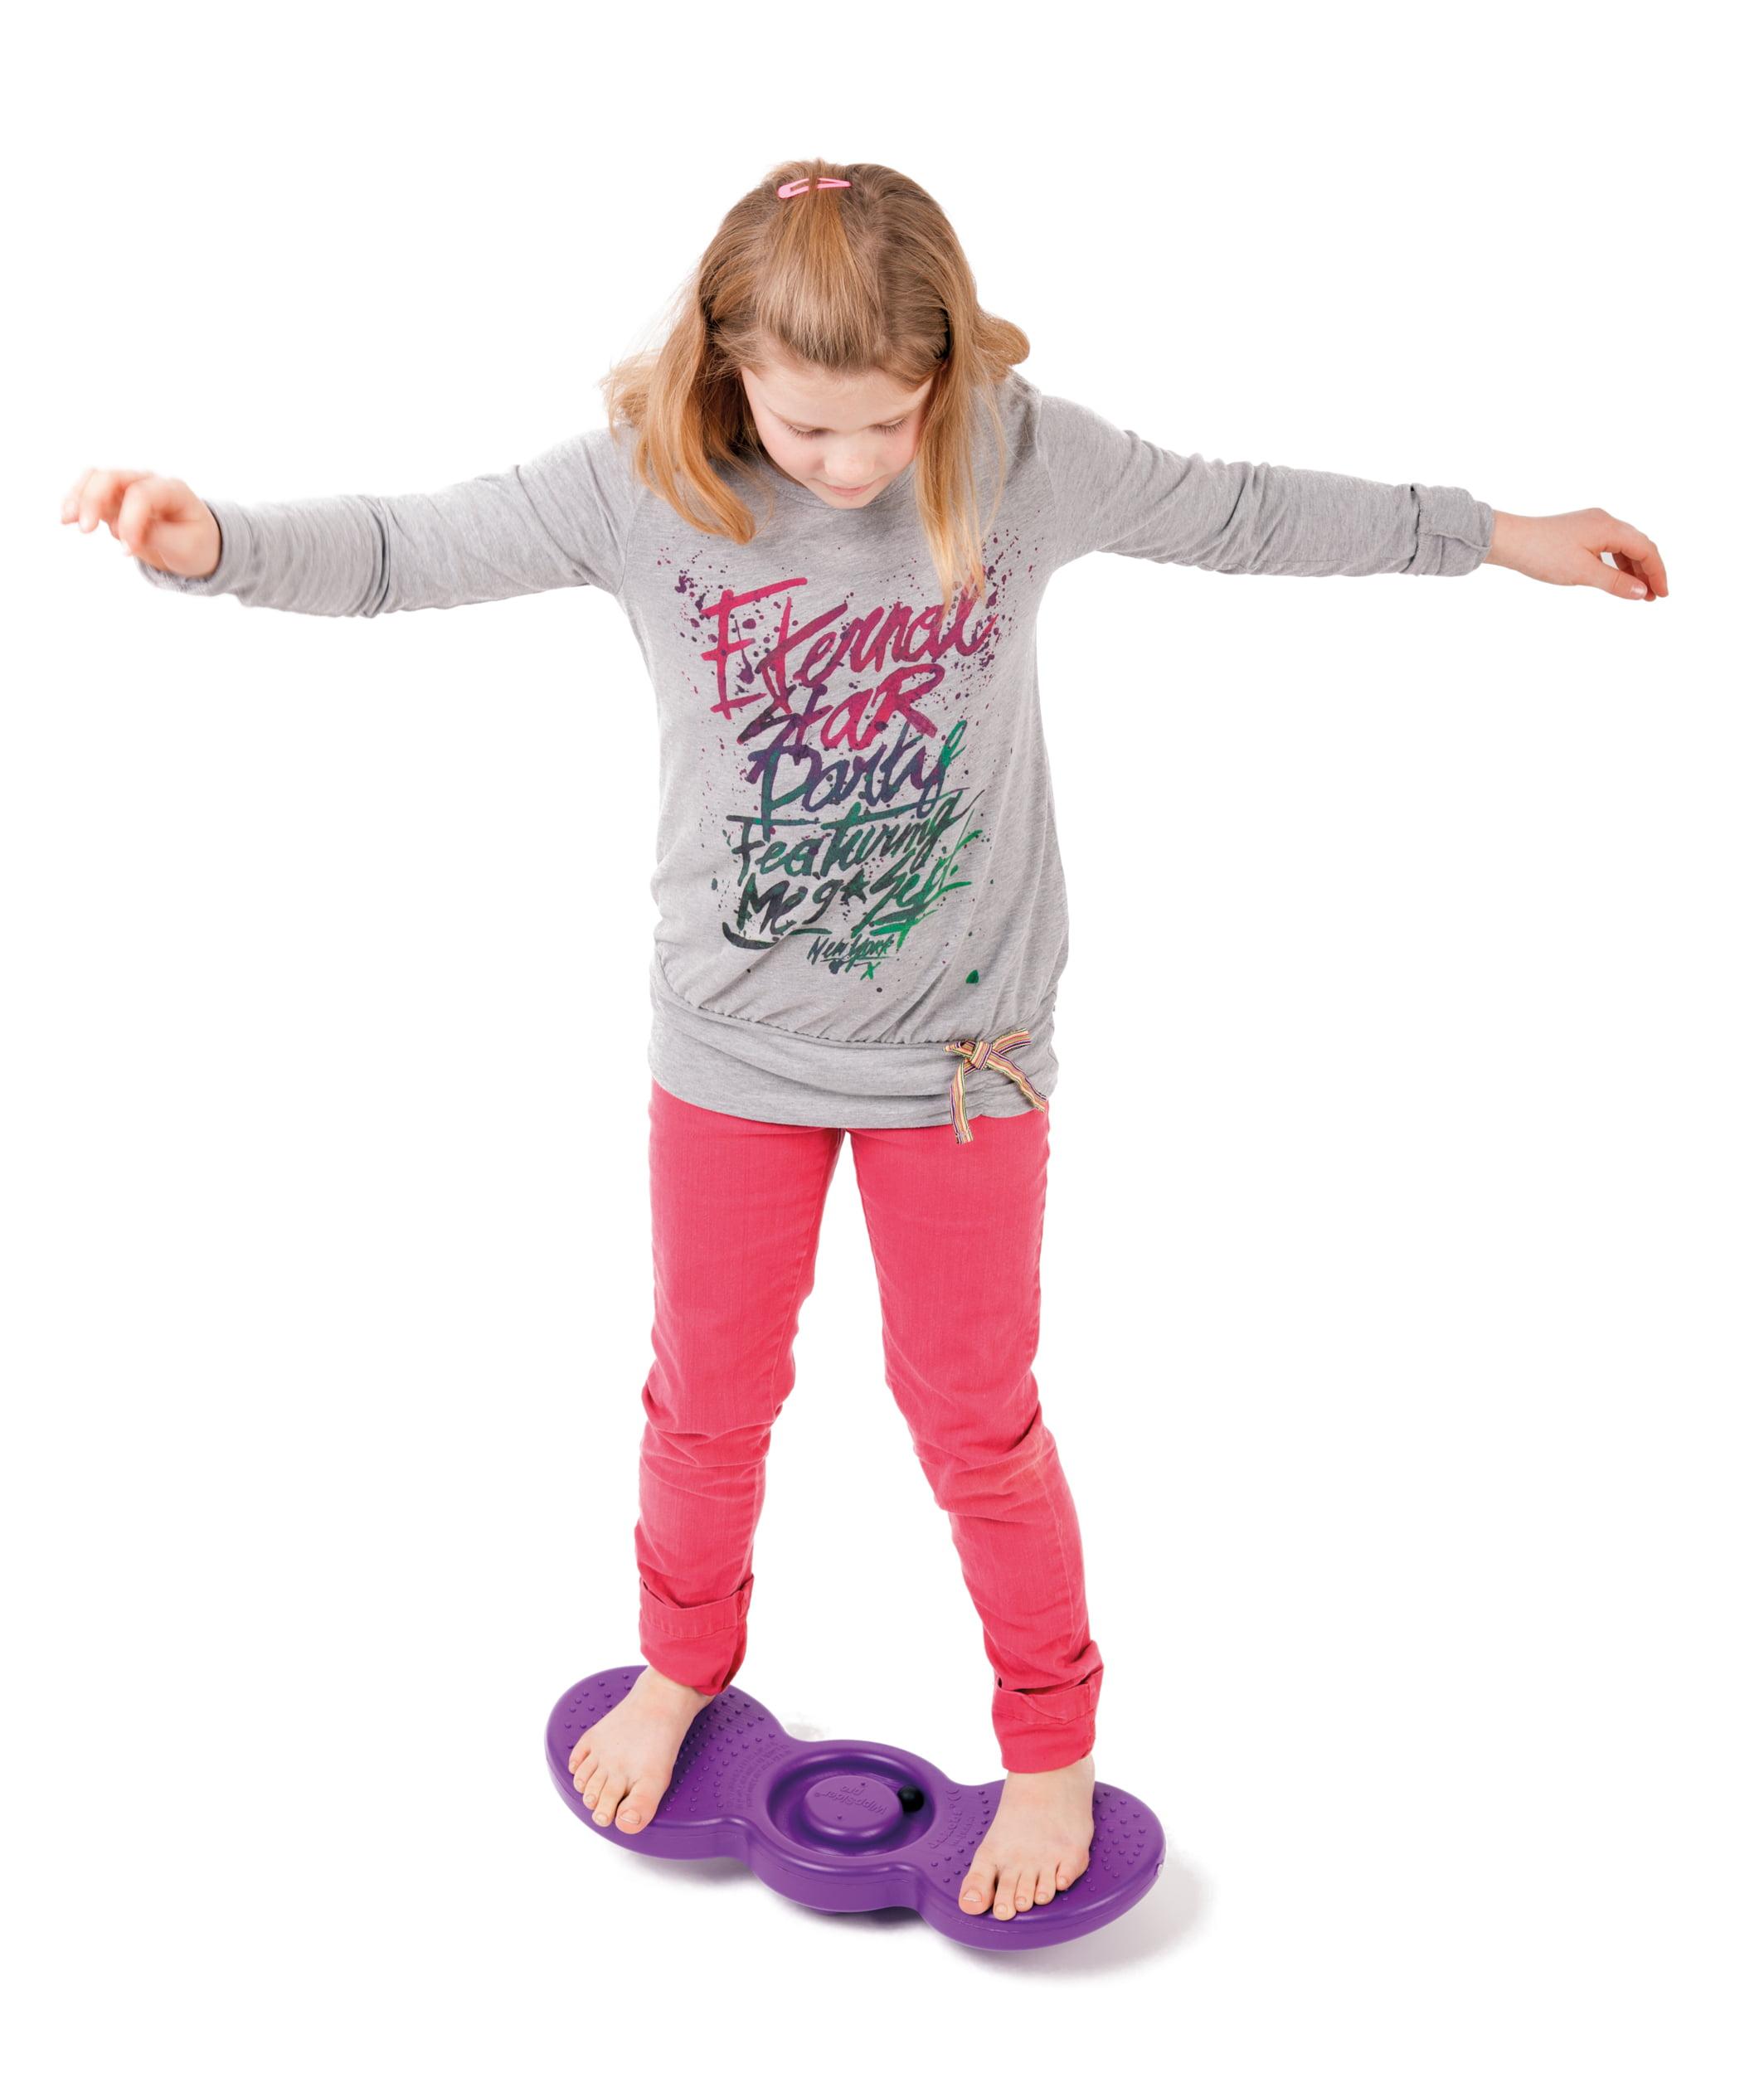 Wippsider Pro - Placa echilibru copii - Jakobs Germania 2